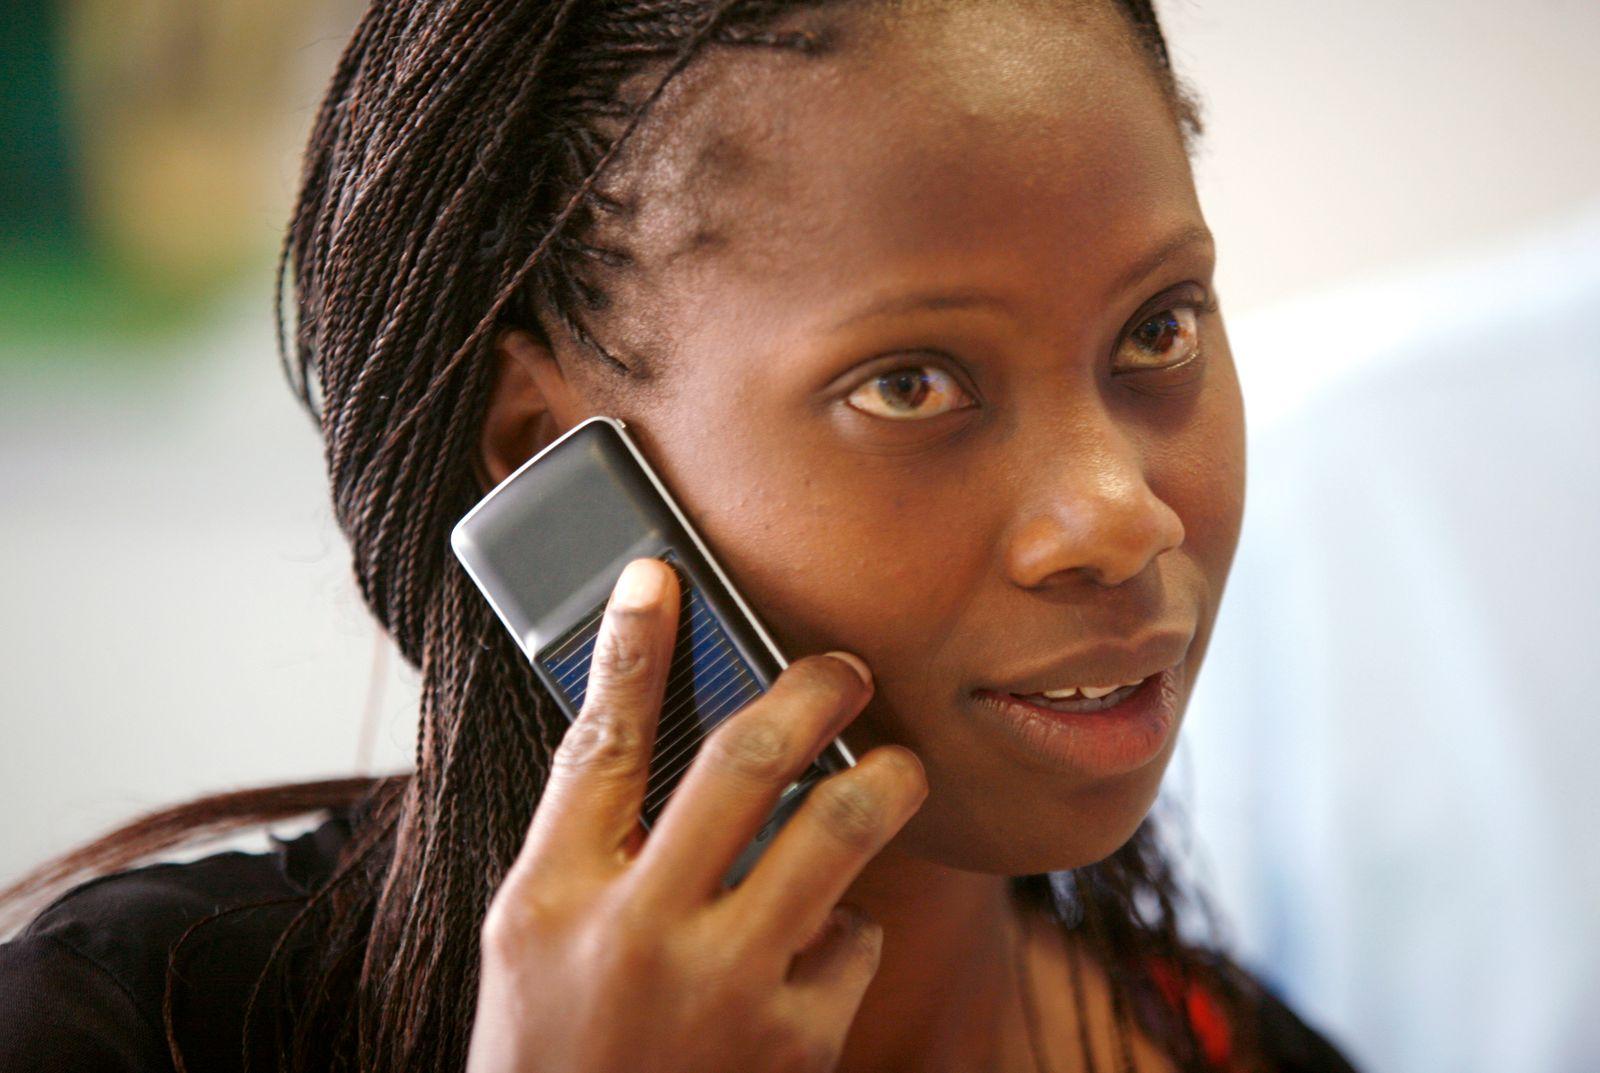 Mobilffunk / Safaricom-User Kenia